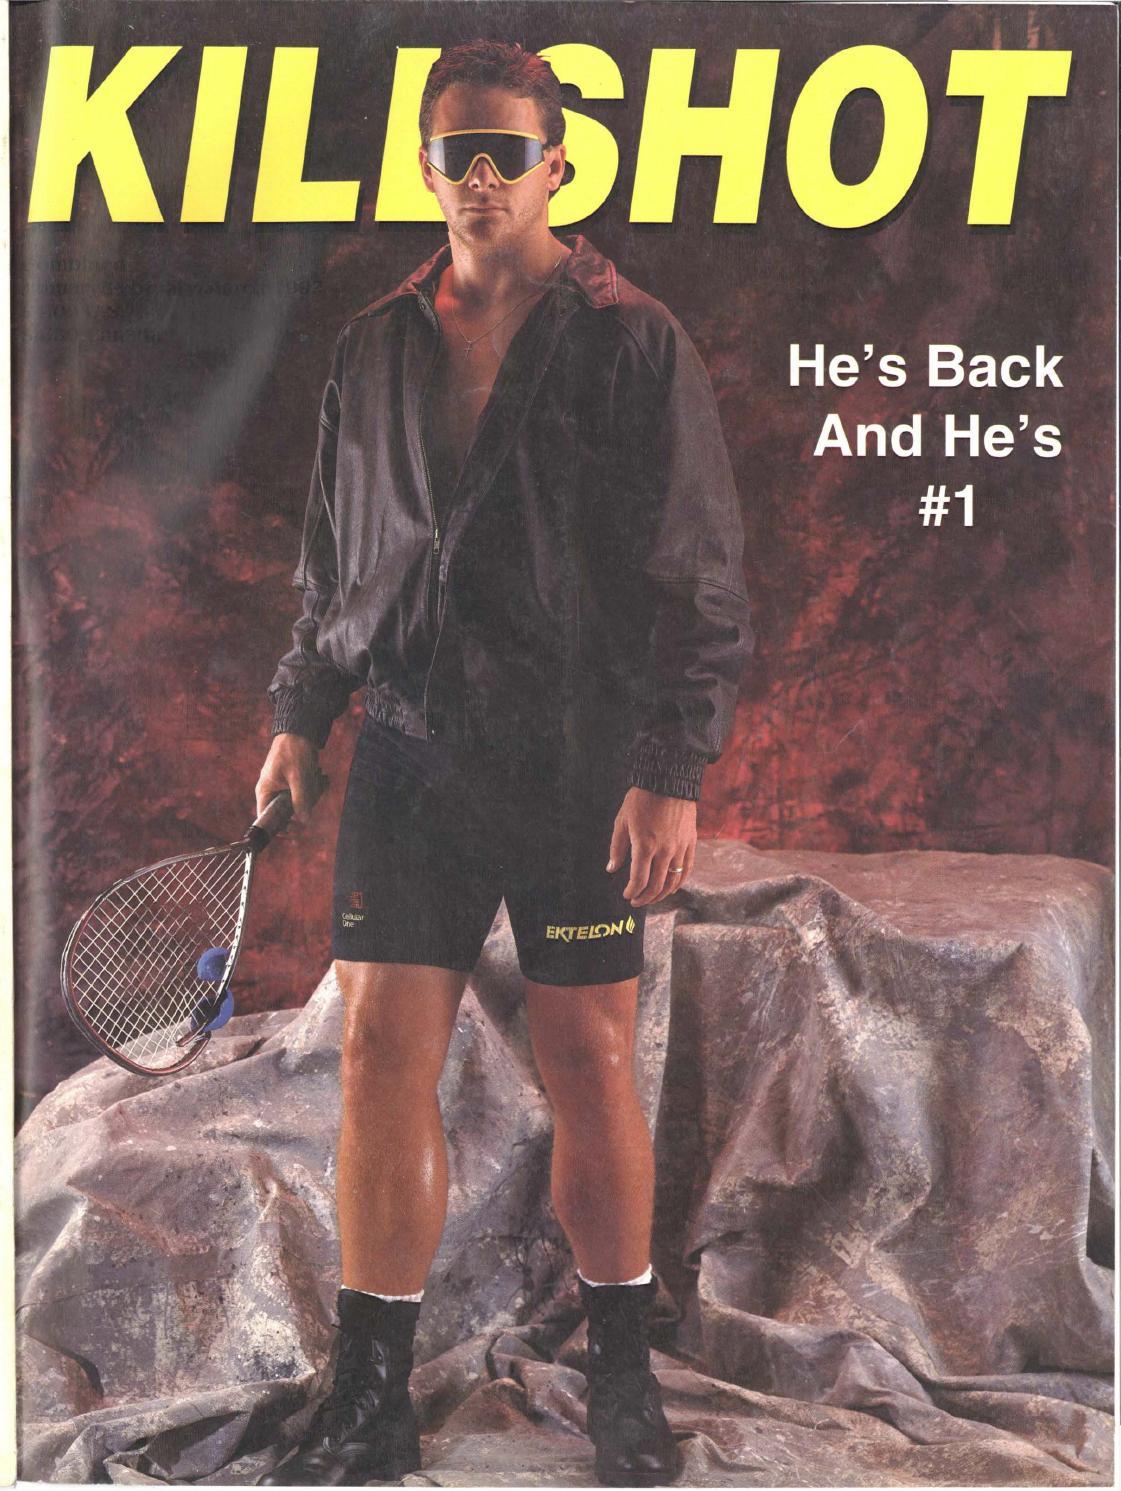 Killshot Racquetball Tournament T Shirt Short Sleeve Red, Blue,Black Colors